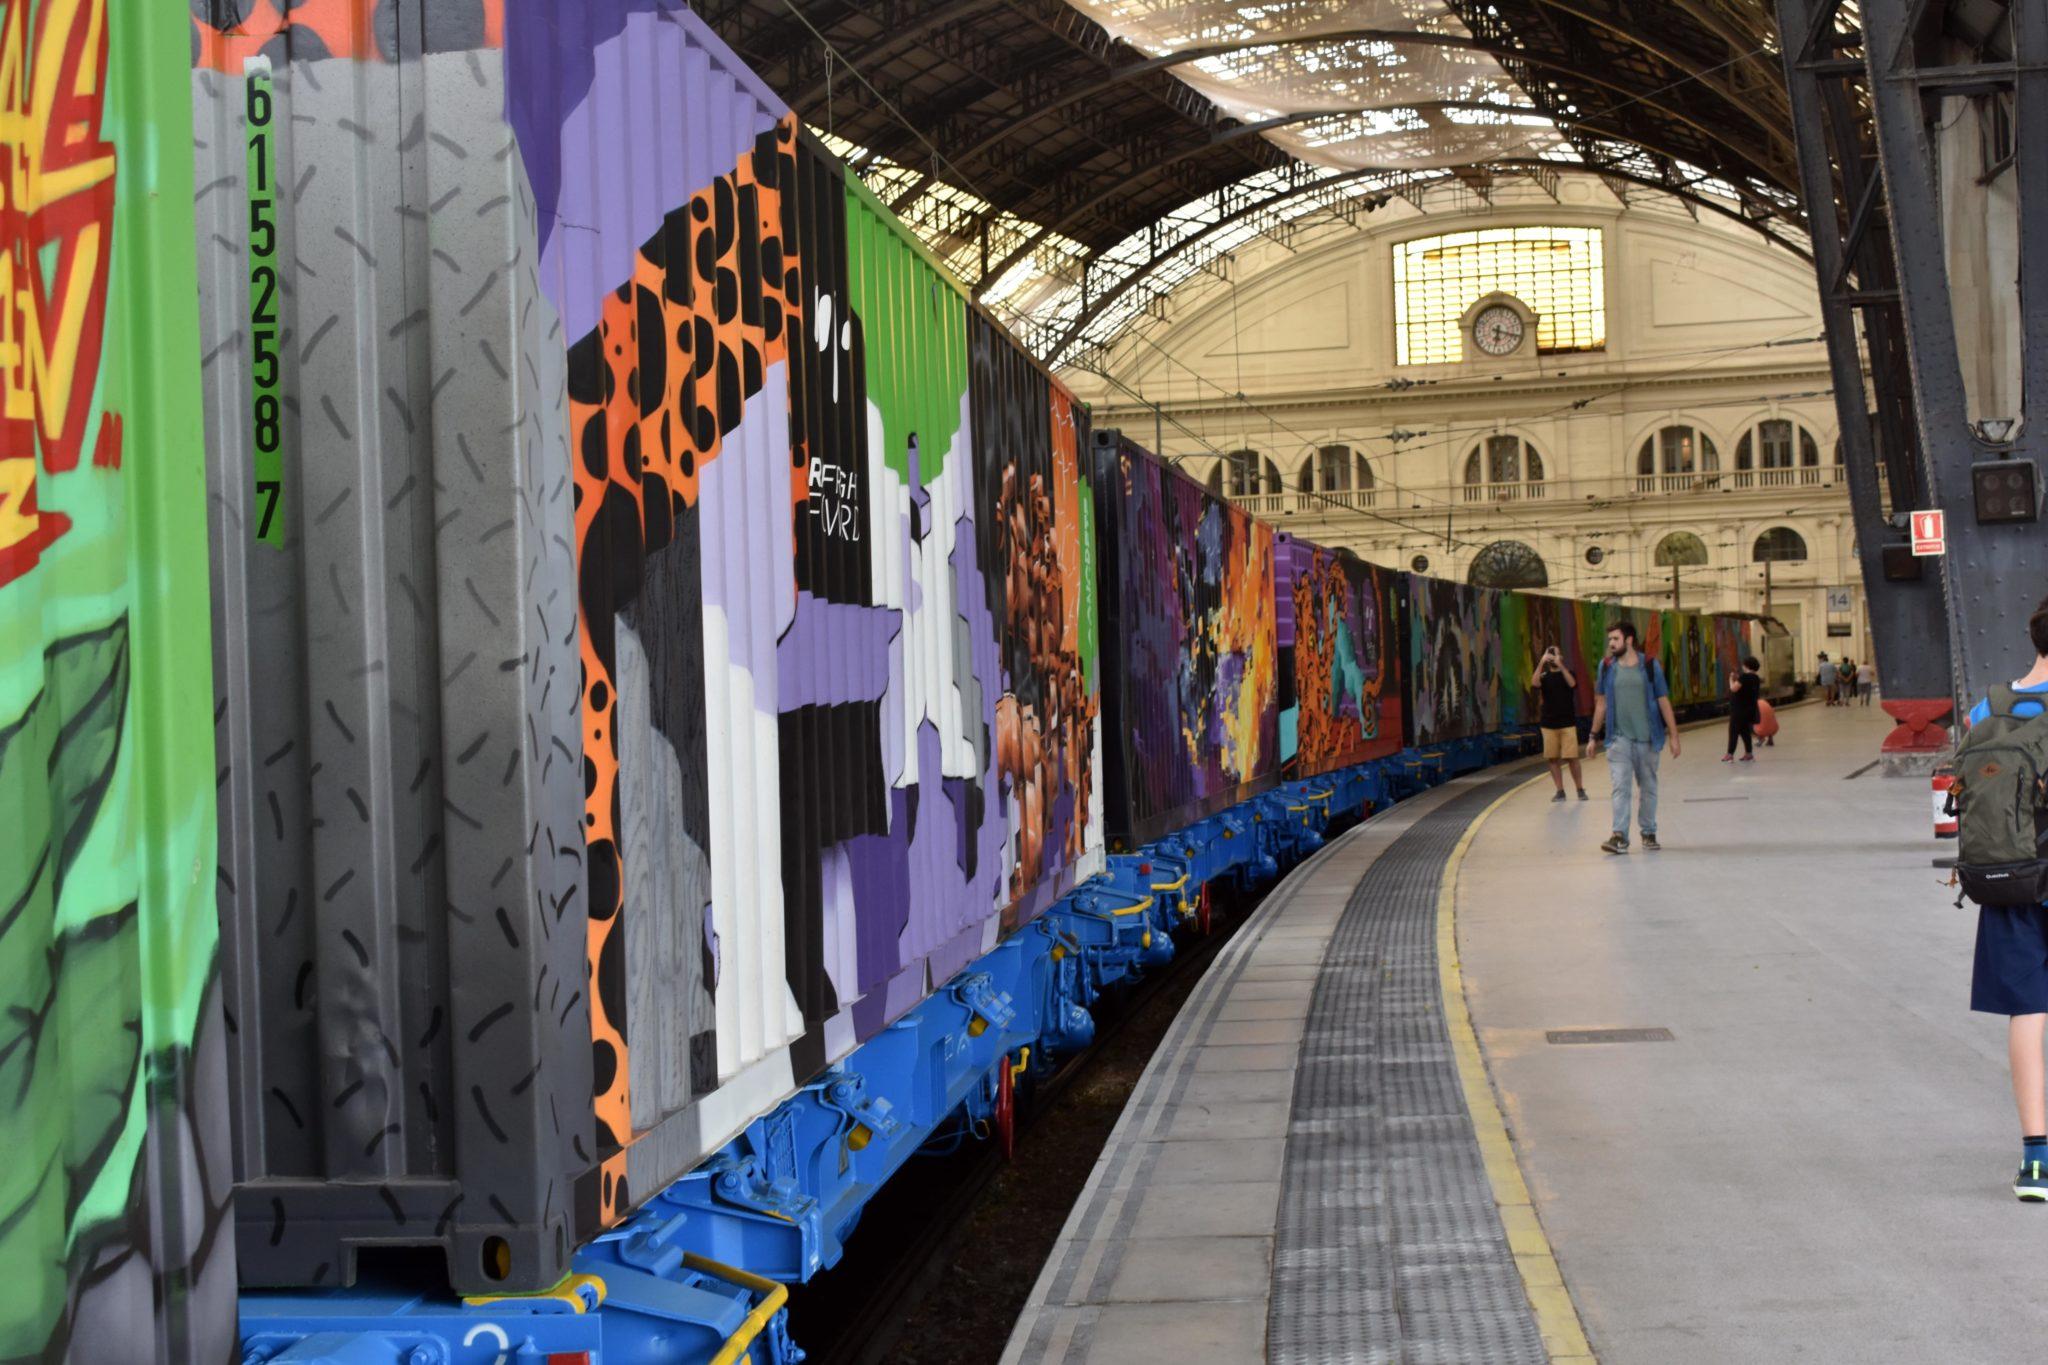 Noah's train street art